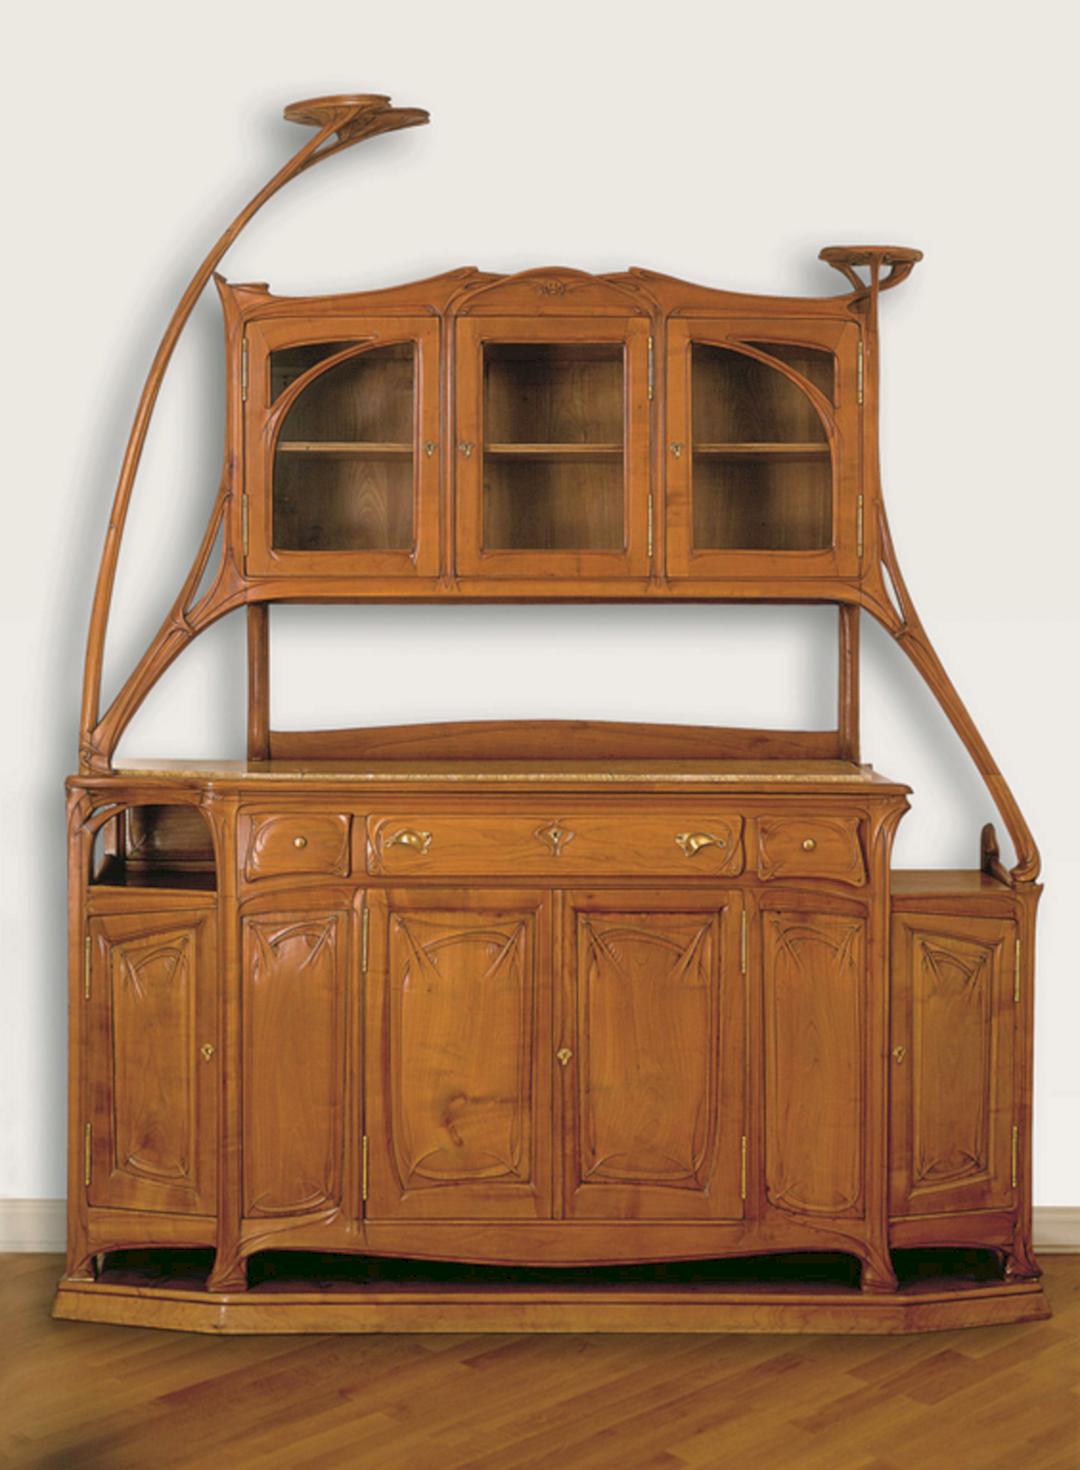 art nouveau style furniture art nouveau style furniture design ideas and photos. Black Bedroom Furniture Sets. Home Design Ideas